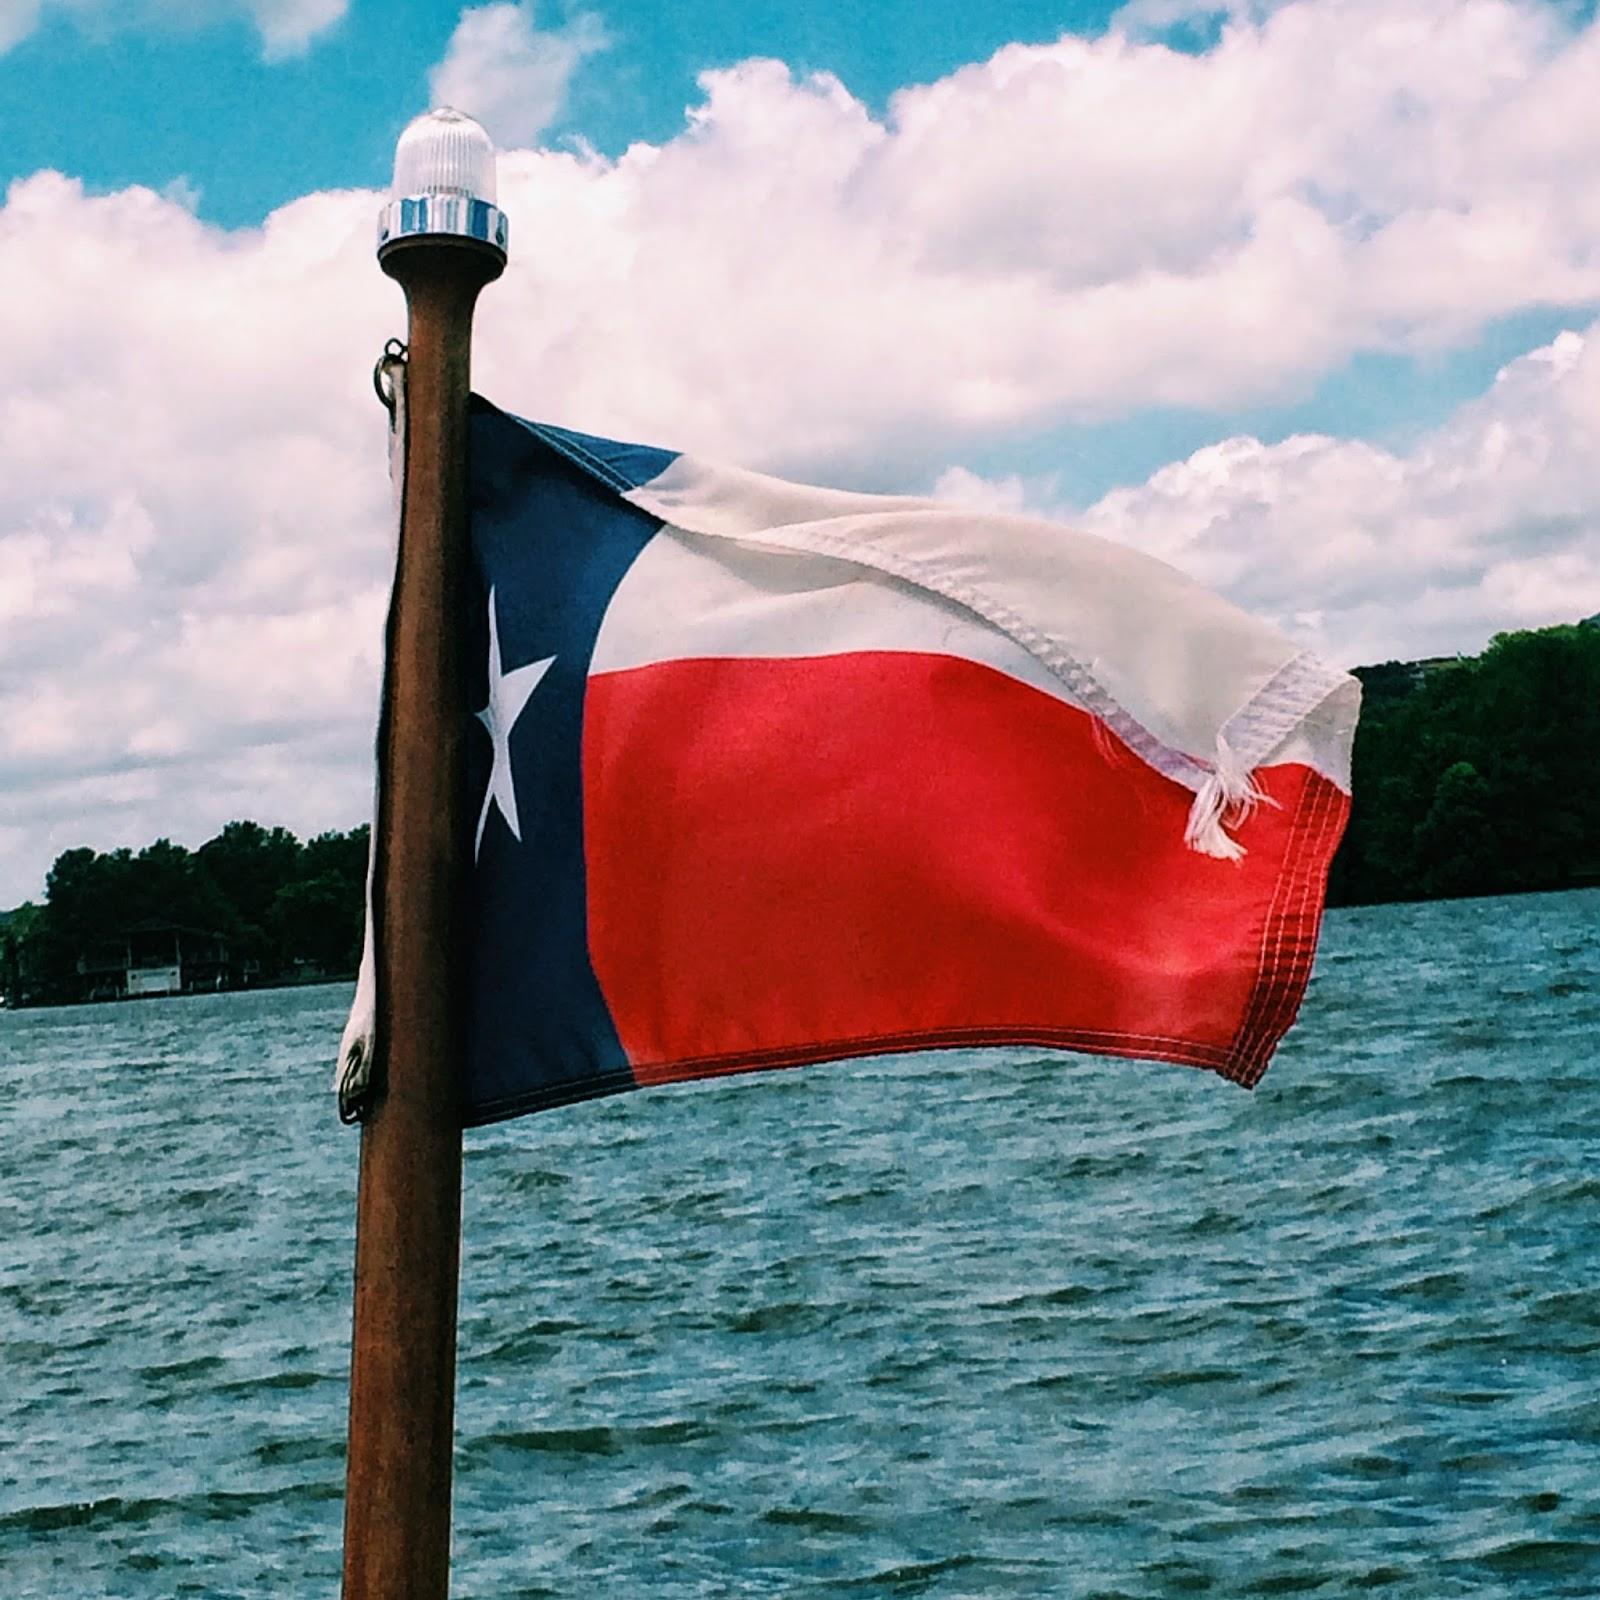 Lake Austin, Lake Austin Texas, Lake Austin Texas Flag, Texas Flag, Lone star Flag, Flag on a Boat. Austin TX, Austin Texas